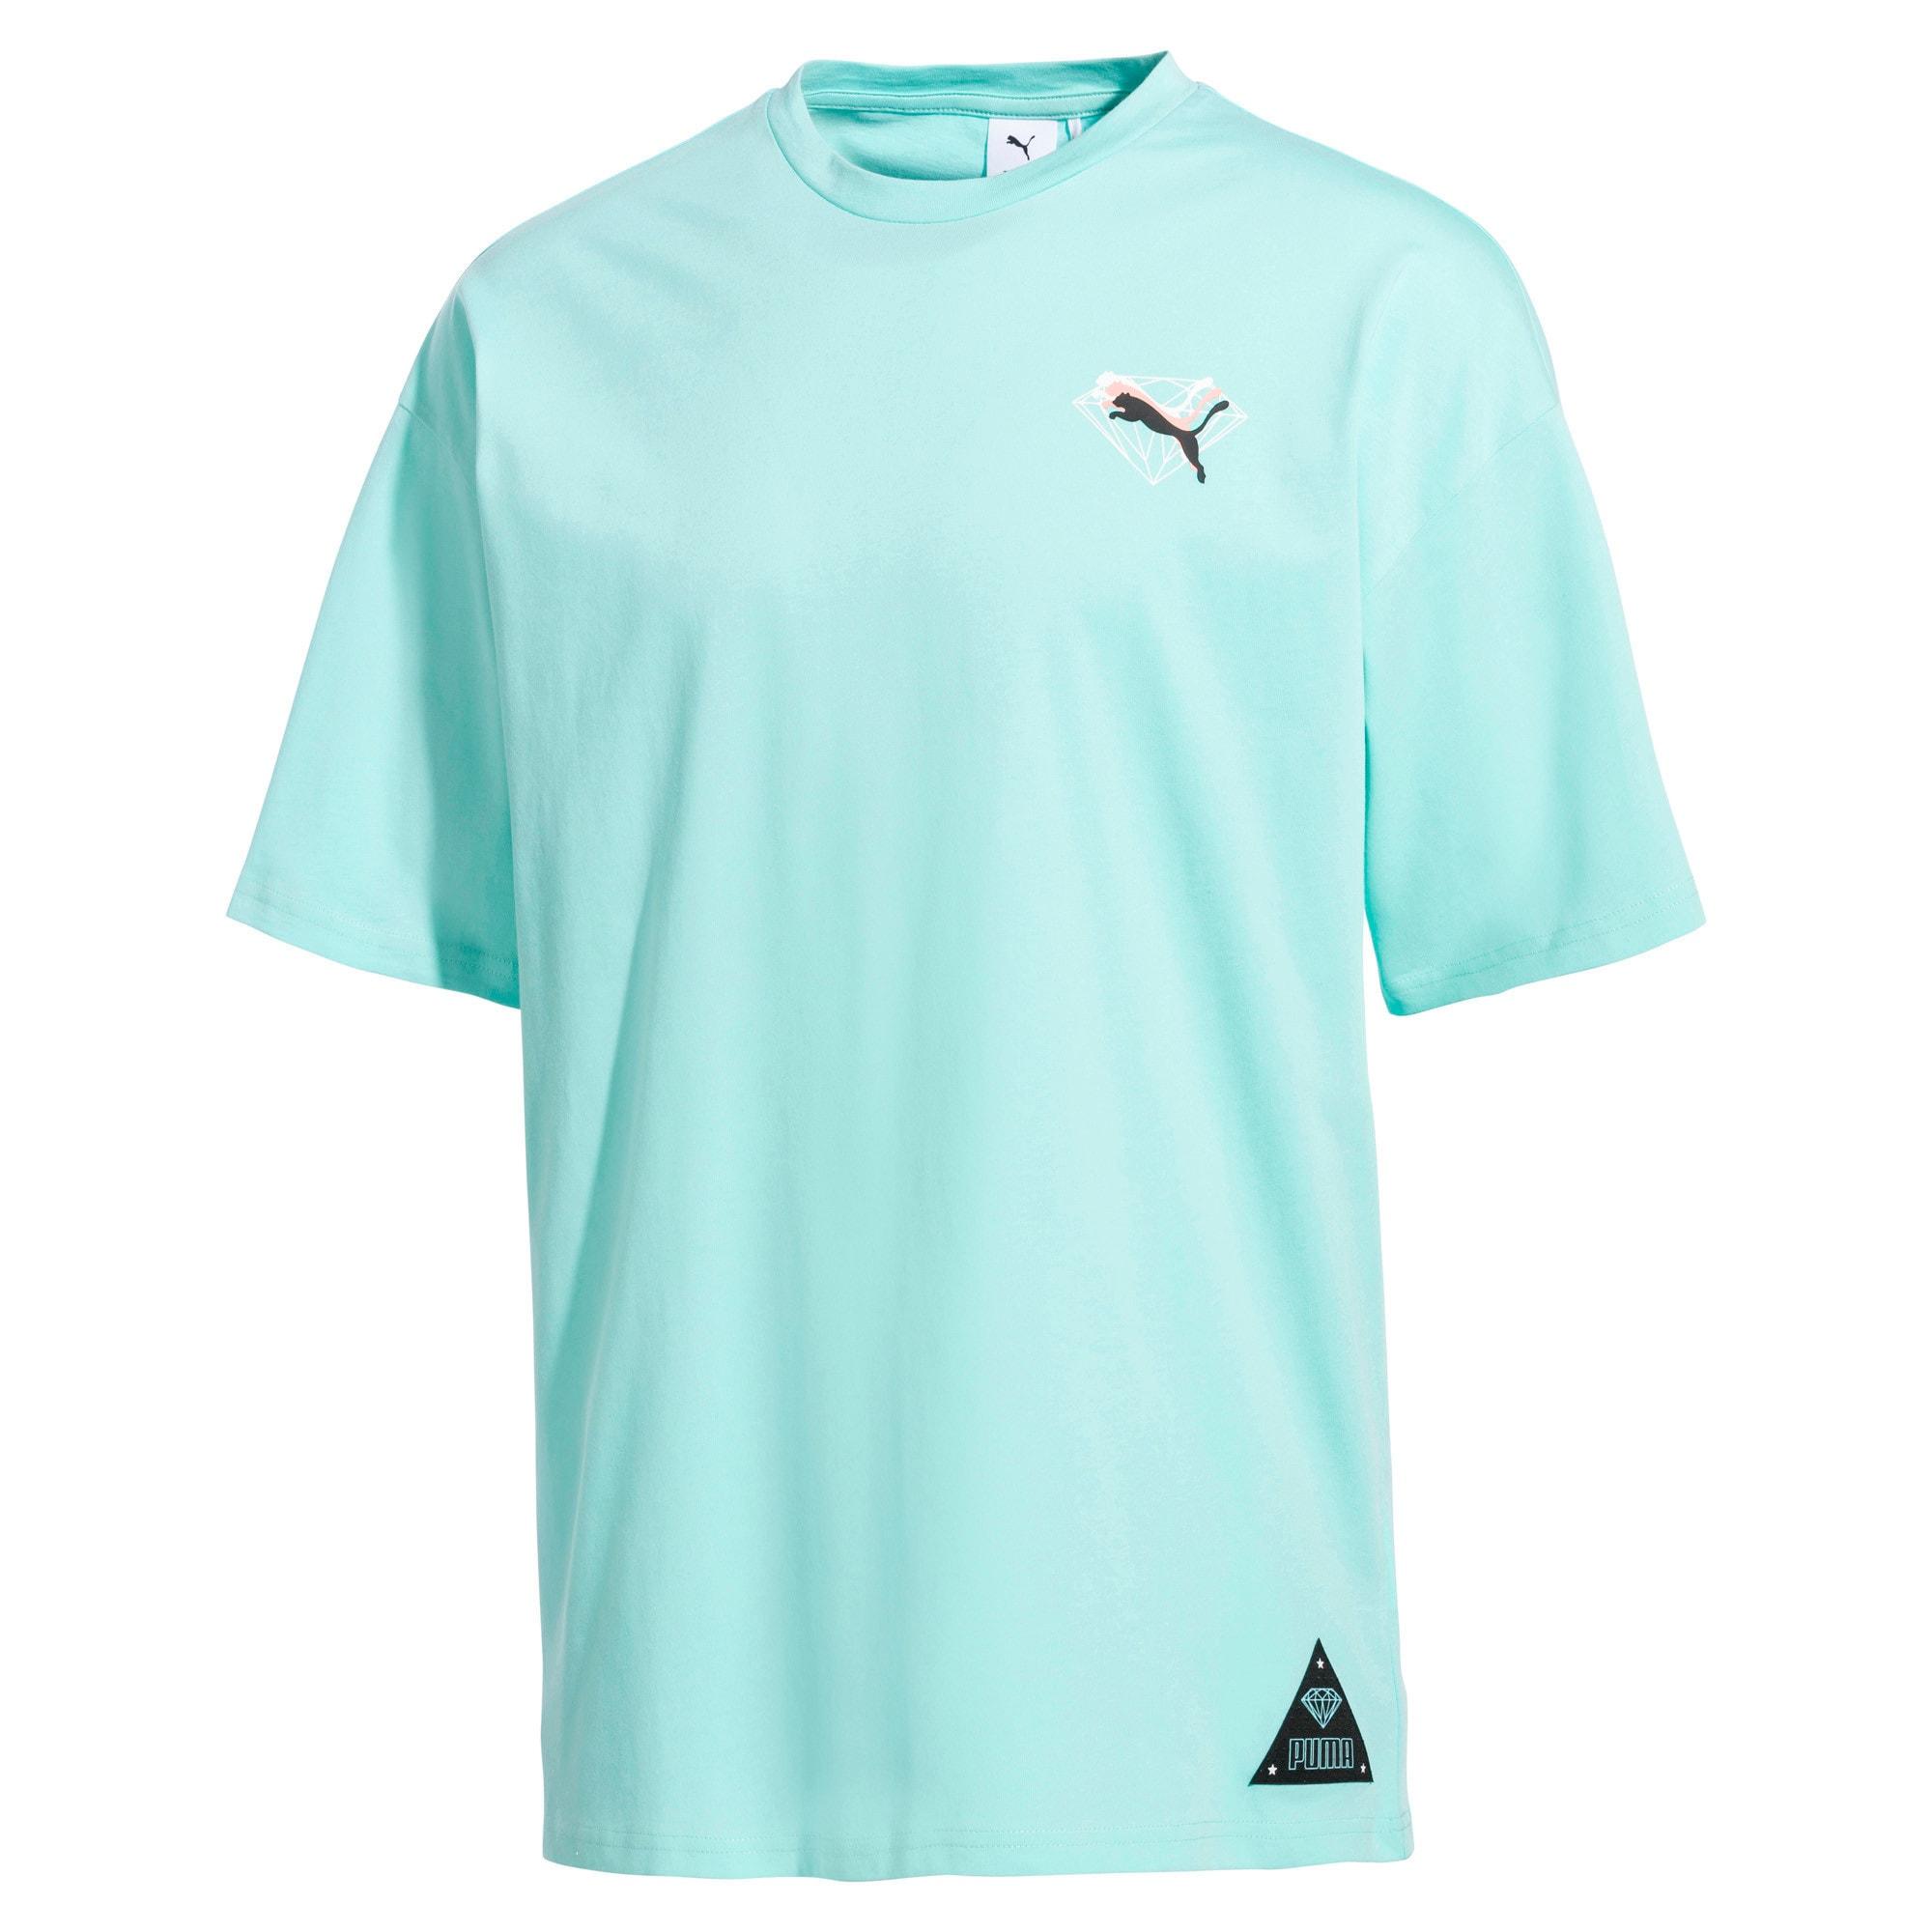 Thumbnail 4 of PUMA x DIAMOND Tシャツ, ARUBA BLUE, medium-JPN